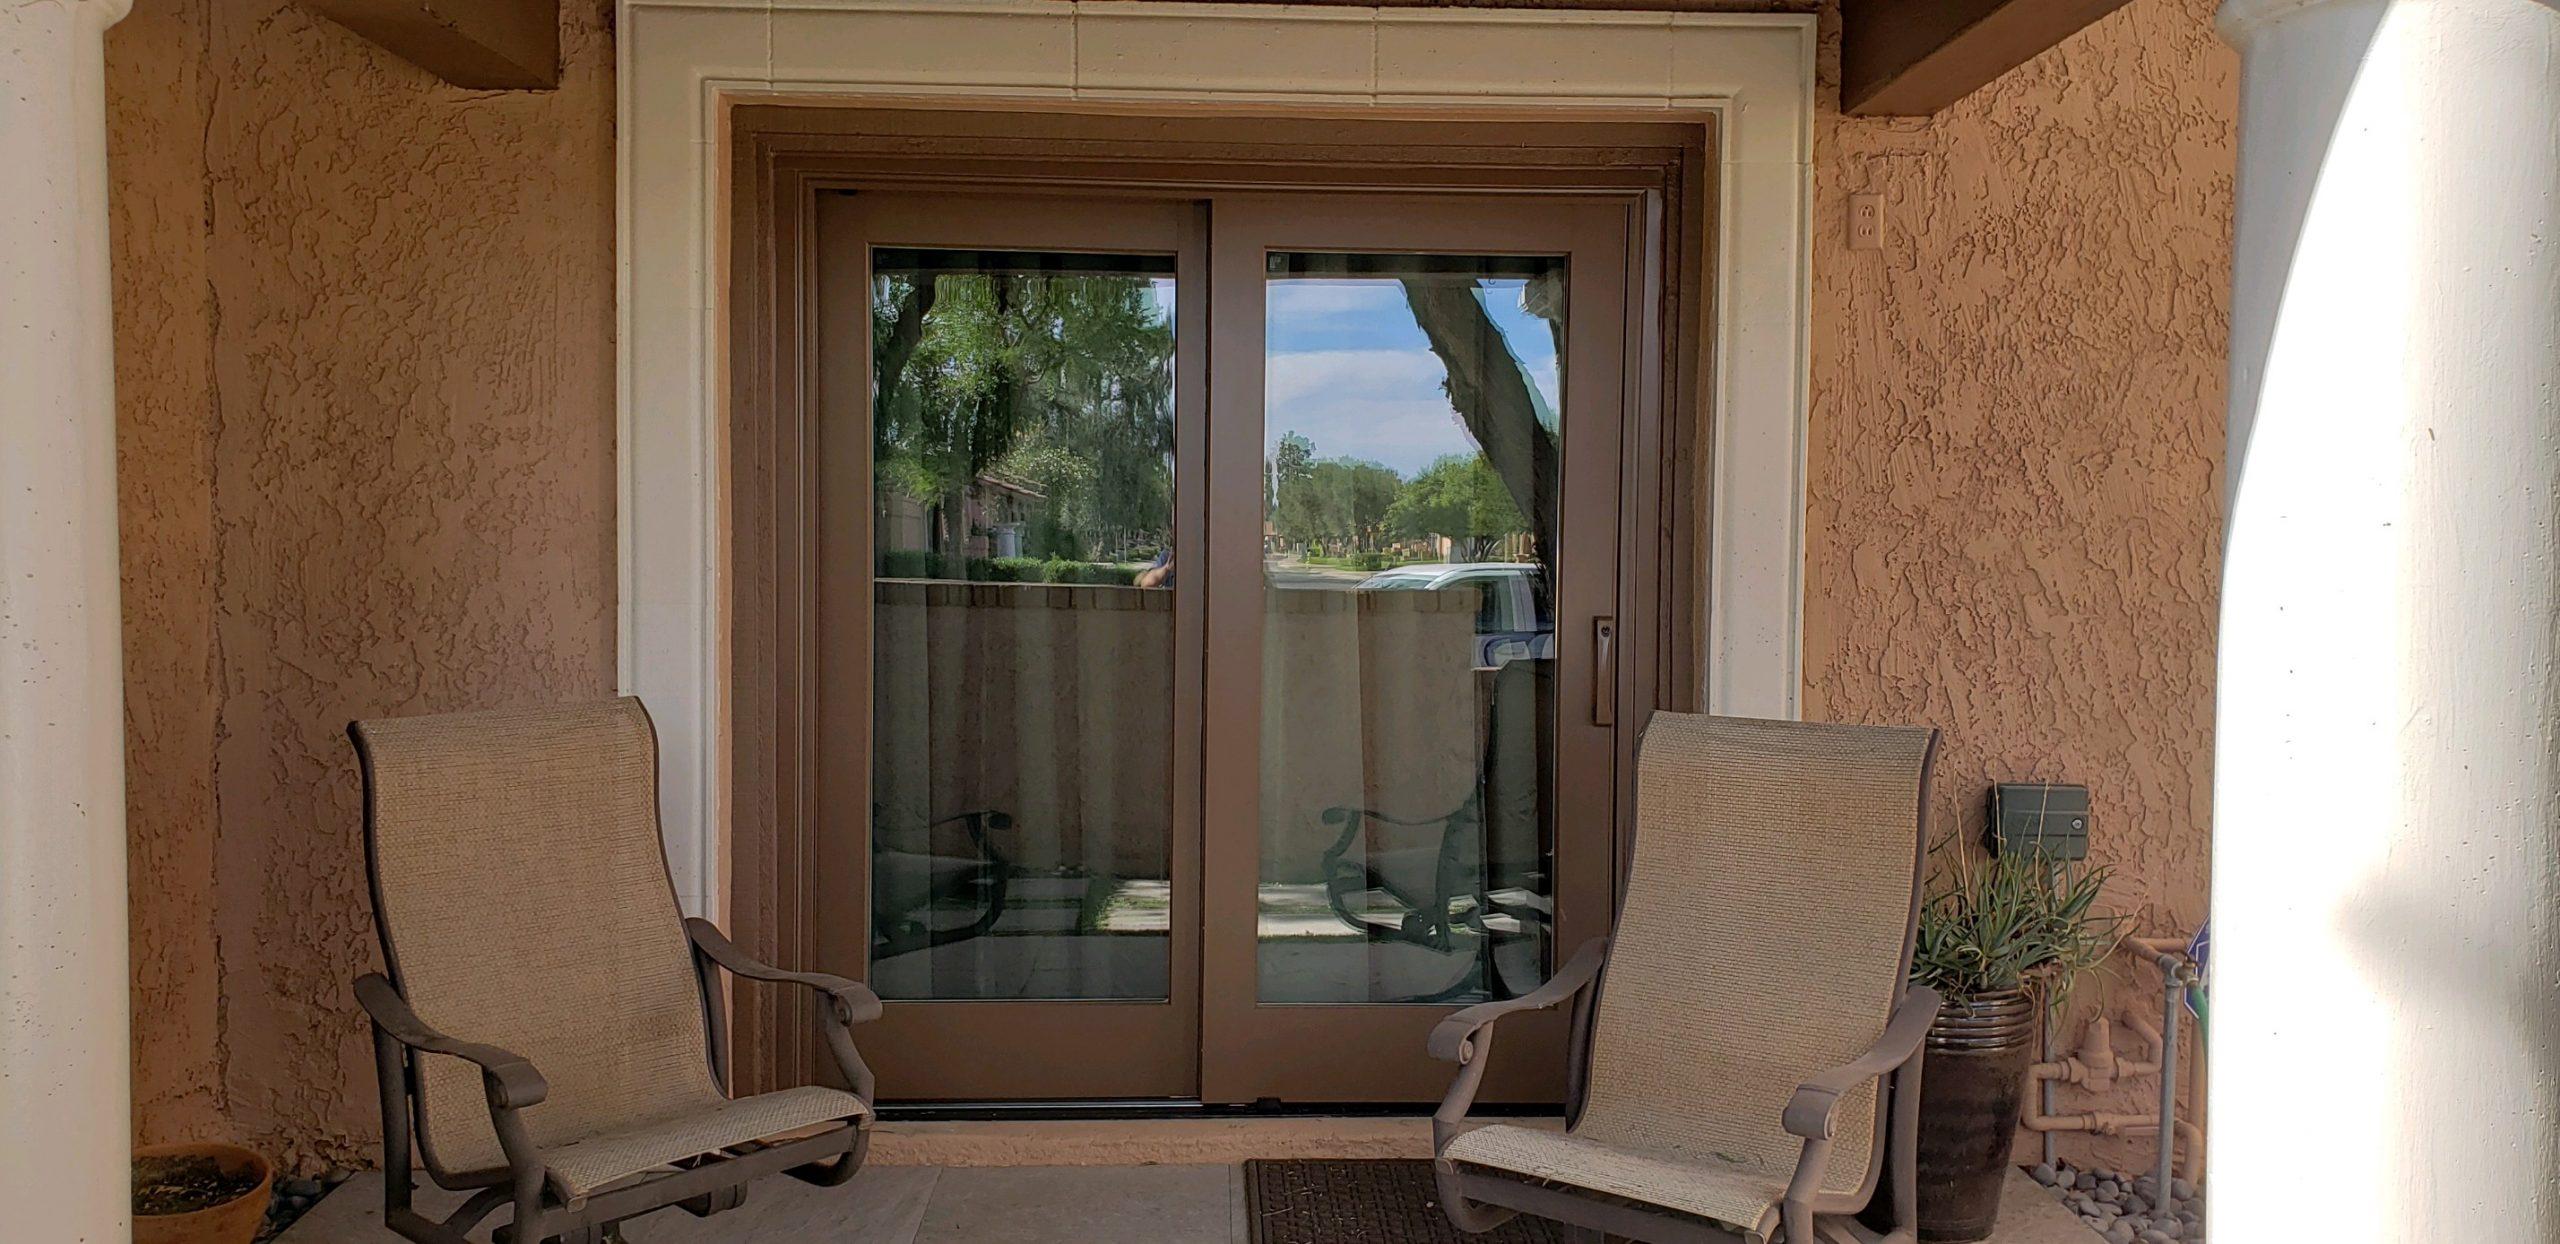 Are Pella Windows Worth It? Image 2